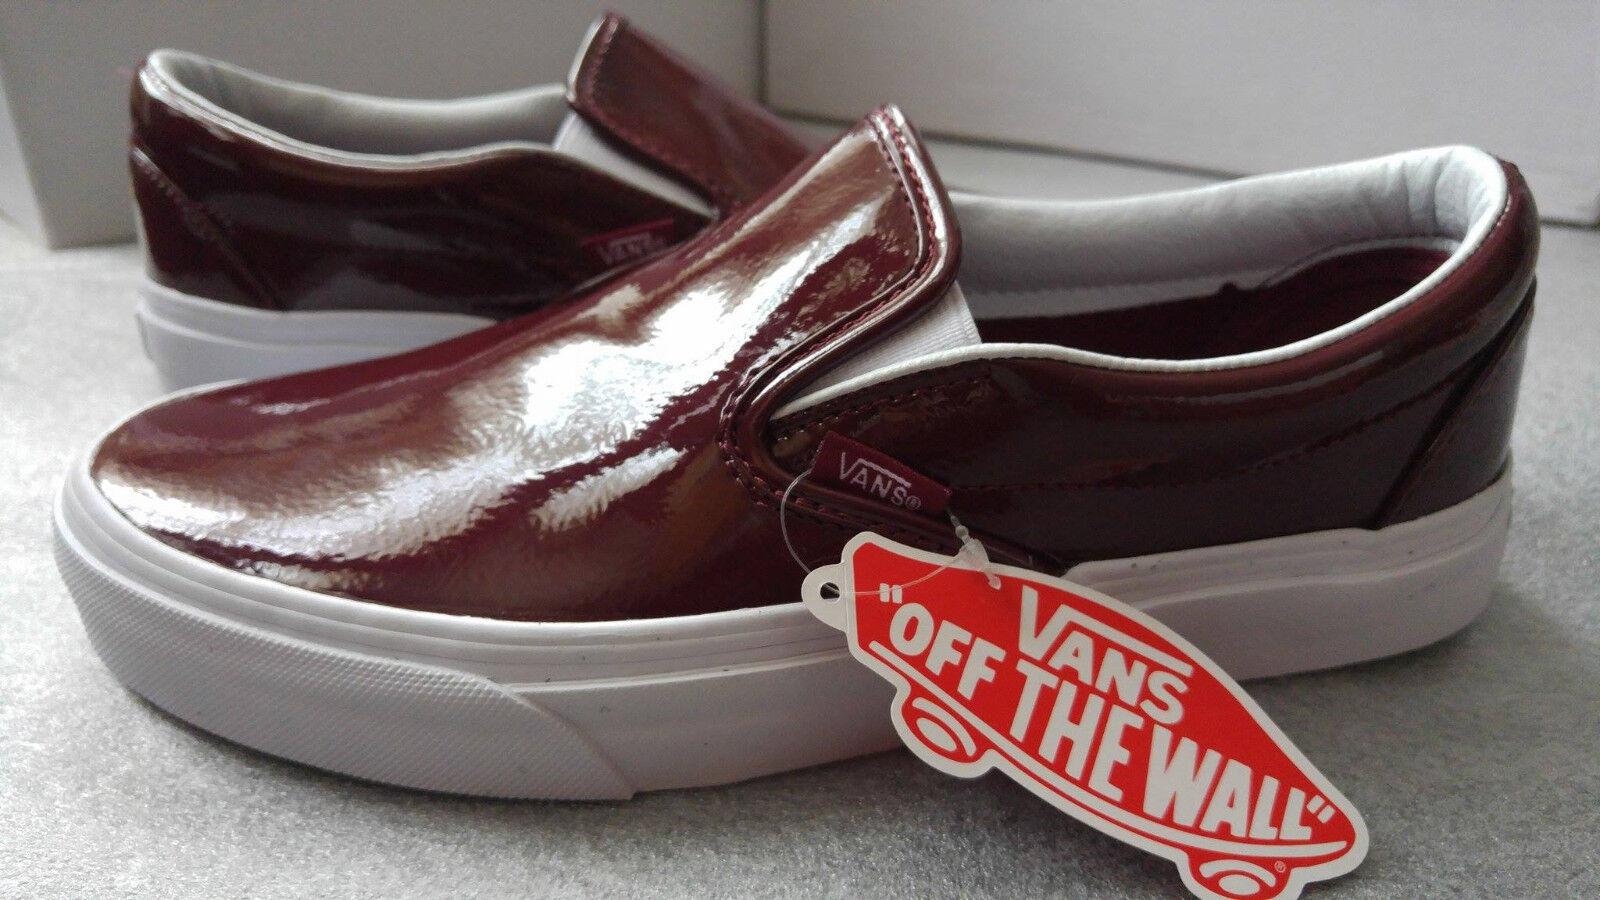 Vans Vans Vans women's burgundy slip-on size 6.5UK (40EU) 5e622d